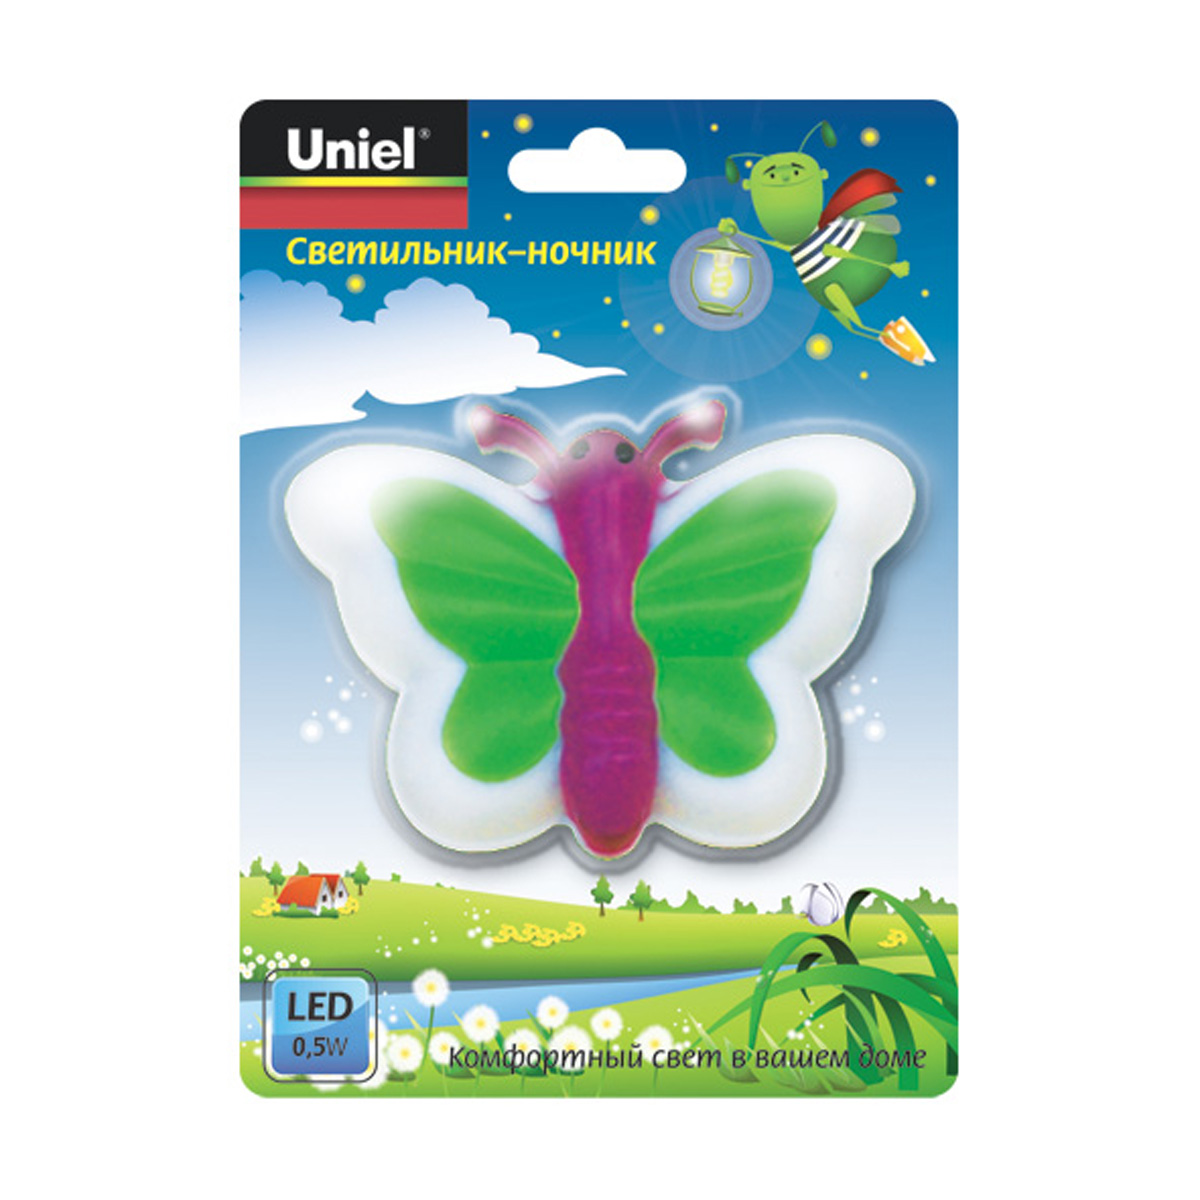 Ночник Uniel Dtl-301-Бабочка/pink/3led/0,5w